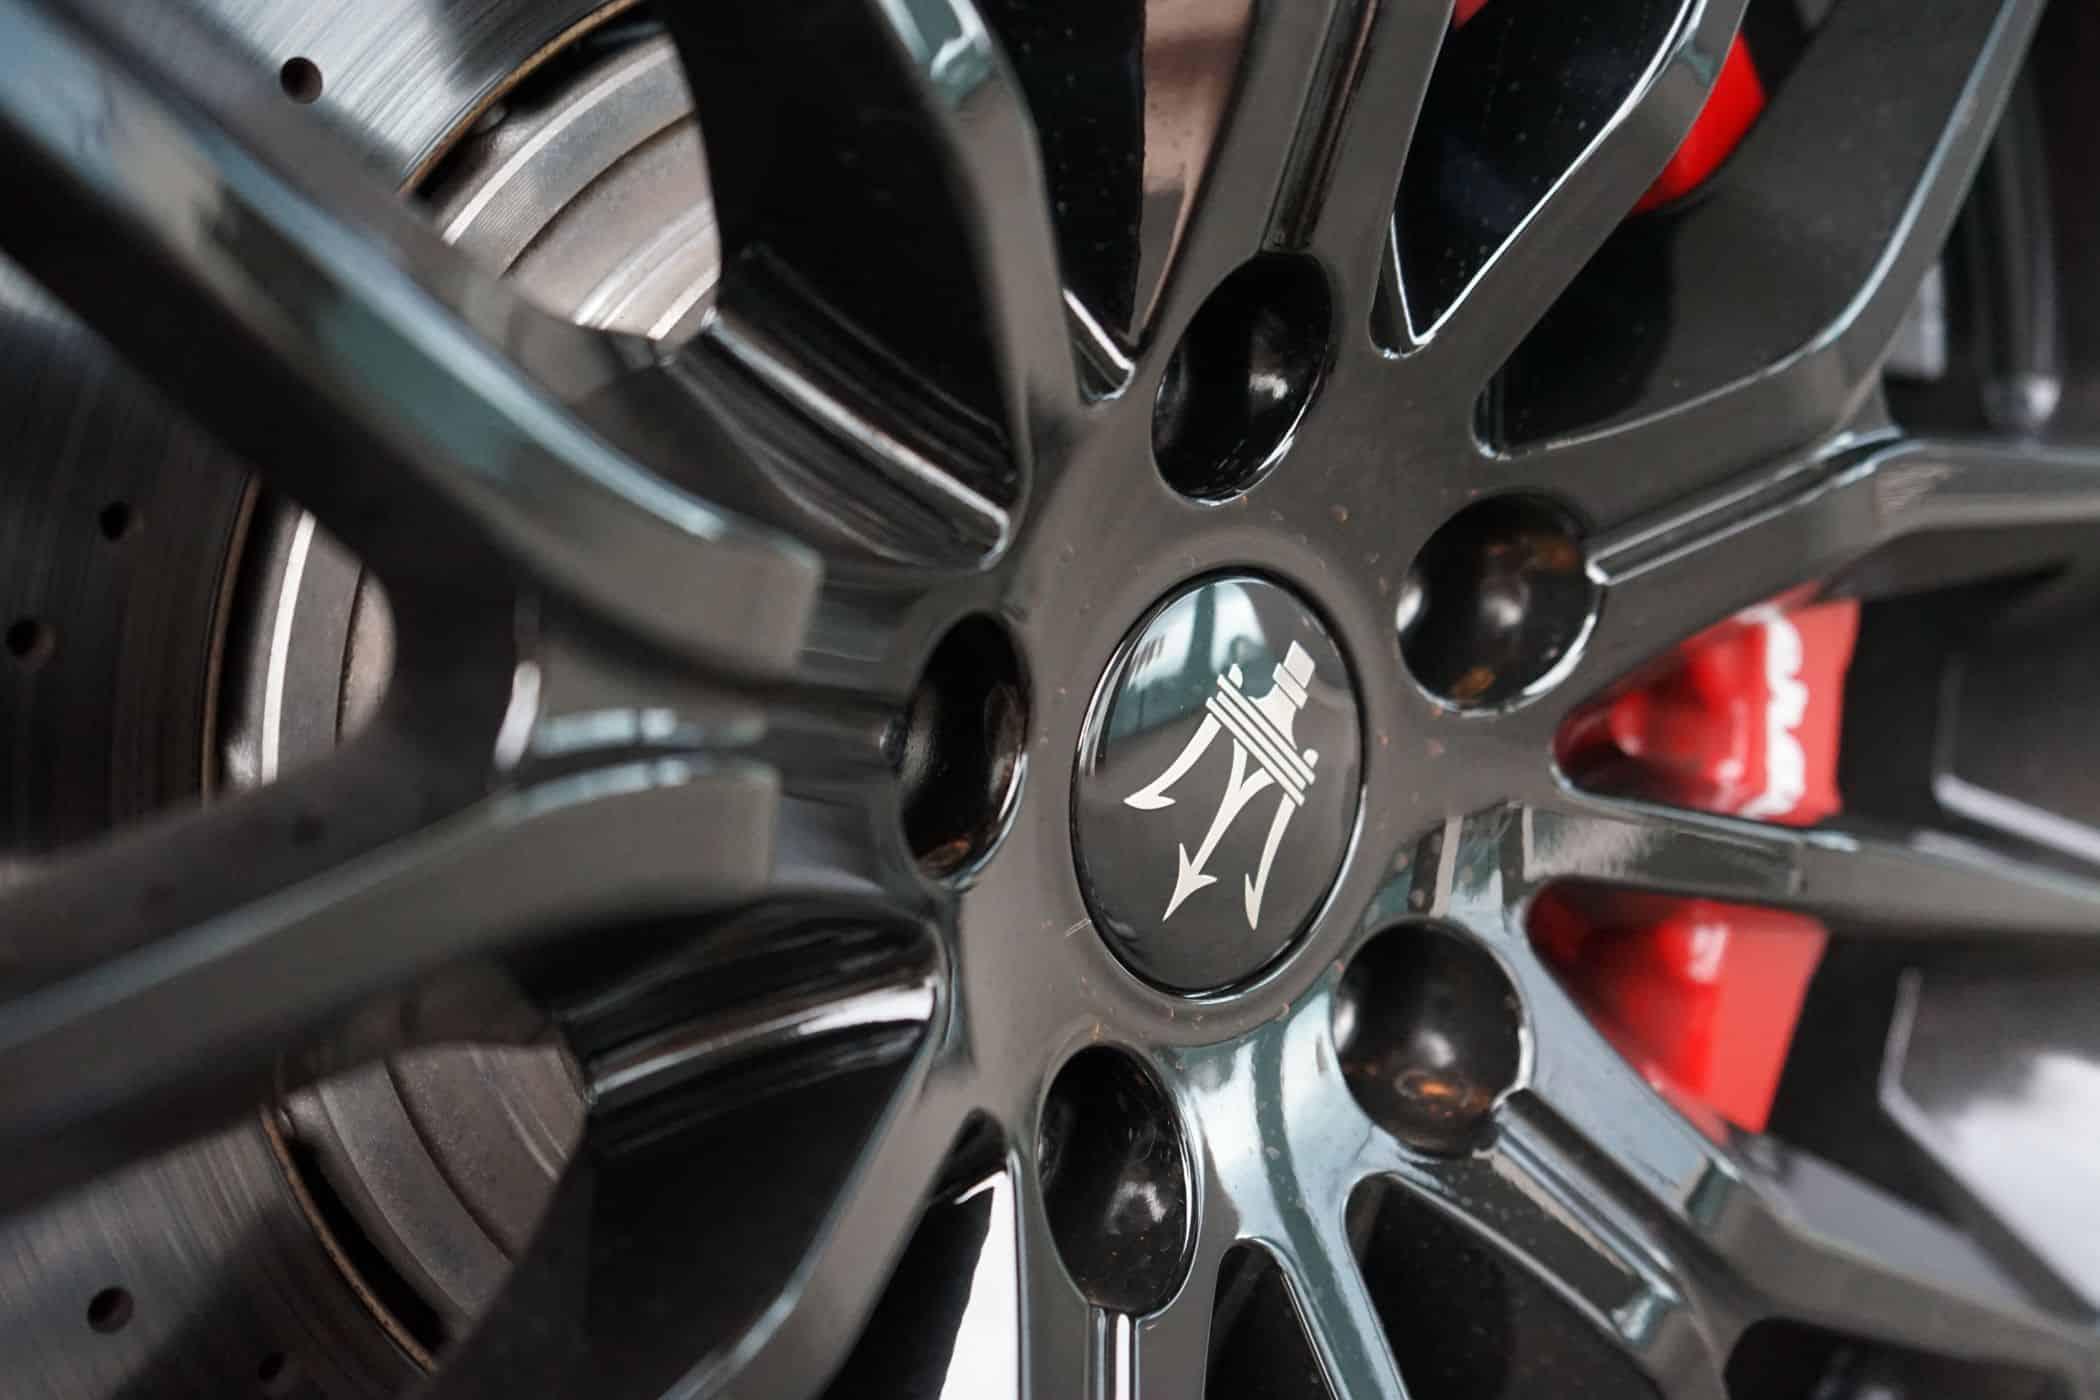 Maserati Ghibli - Sportliche Limousine für italo-phile Freigeister